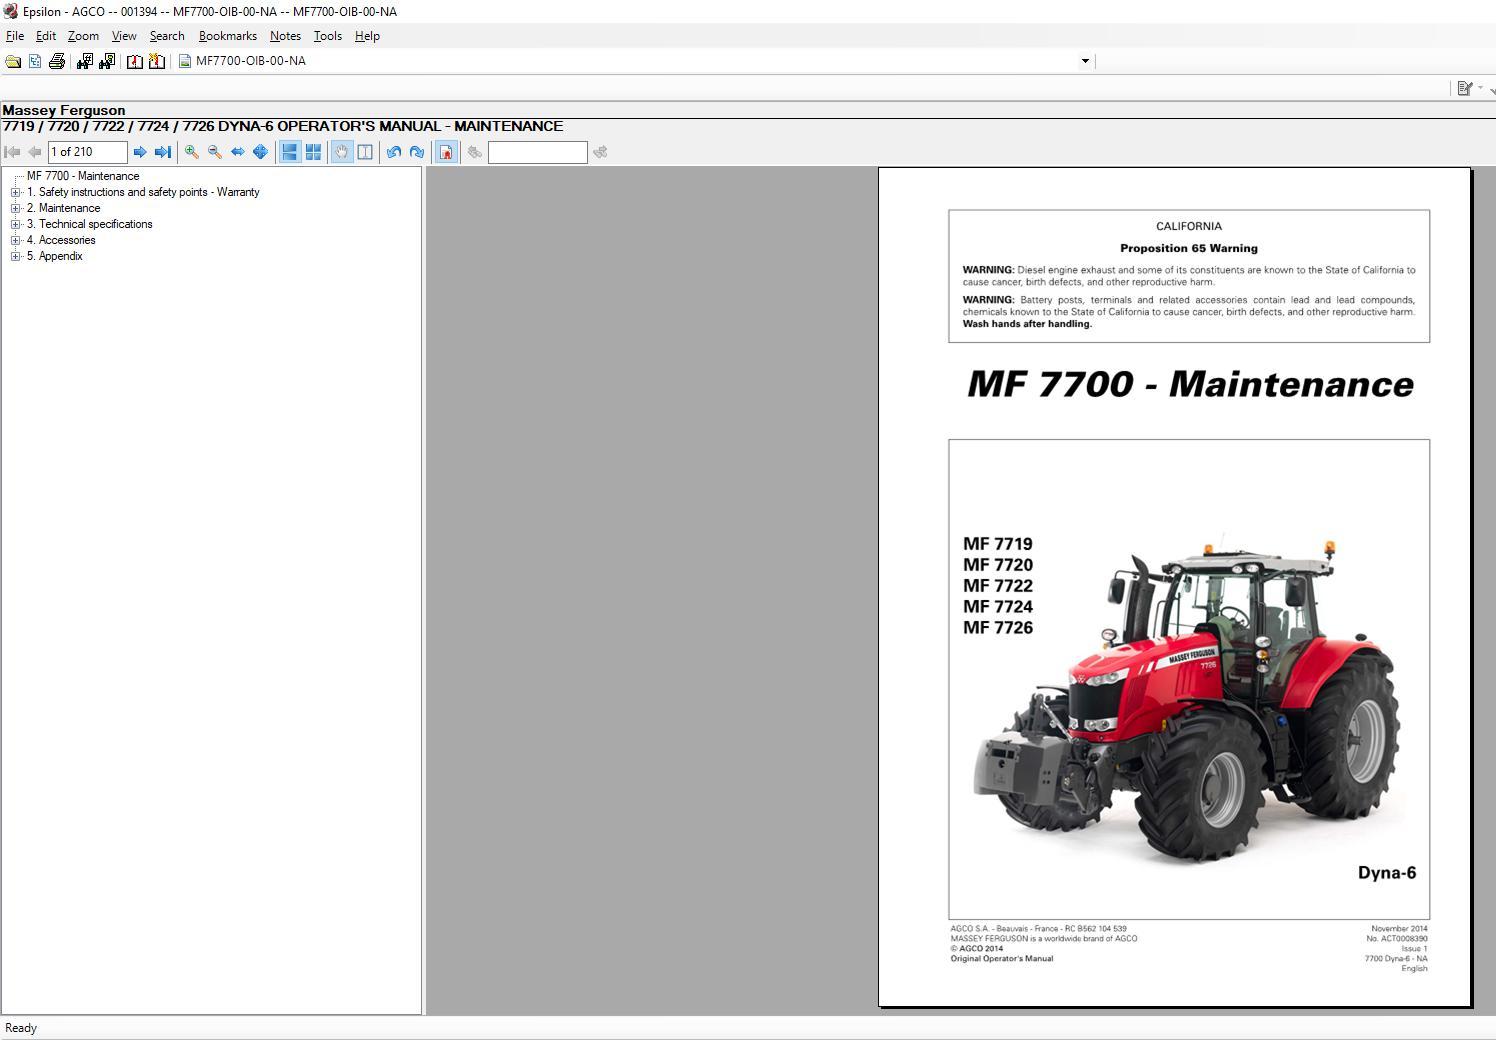 Massey_Ferguson_AG_Europe_Parts_Catalog_Workshop_Service_Manuals_2020_1